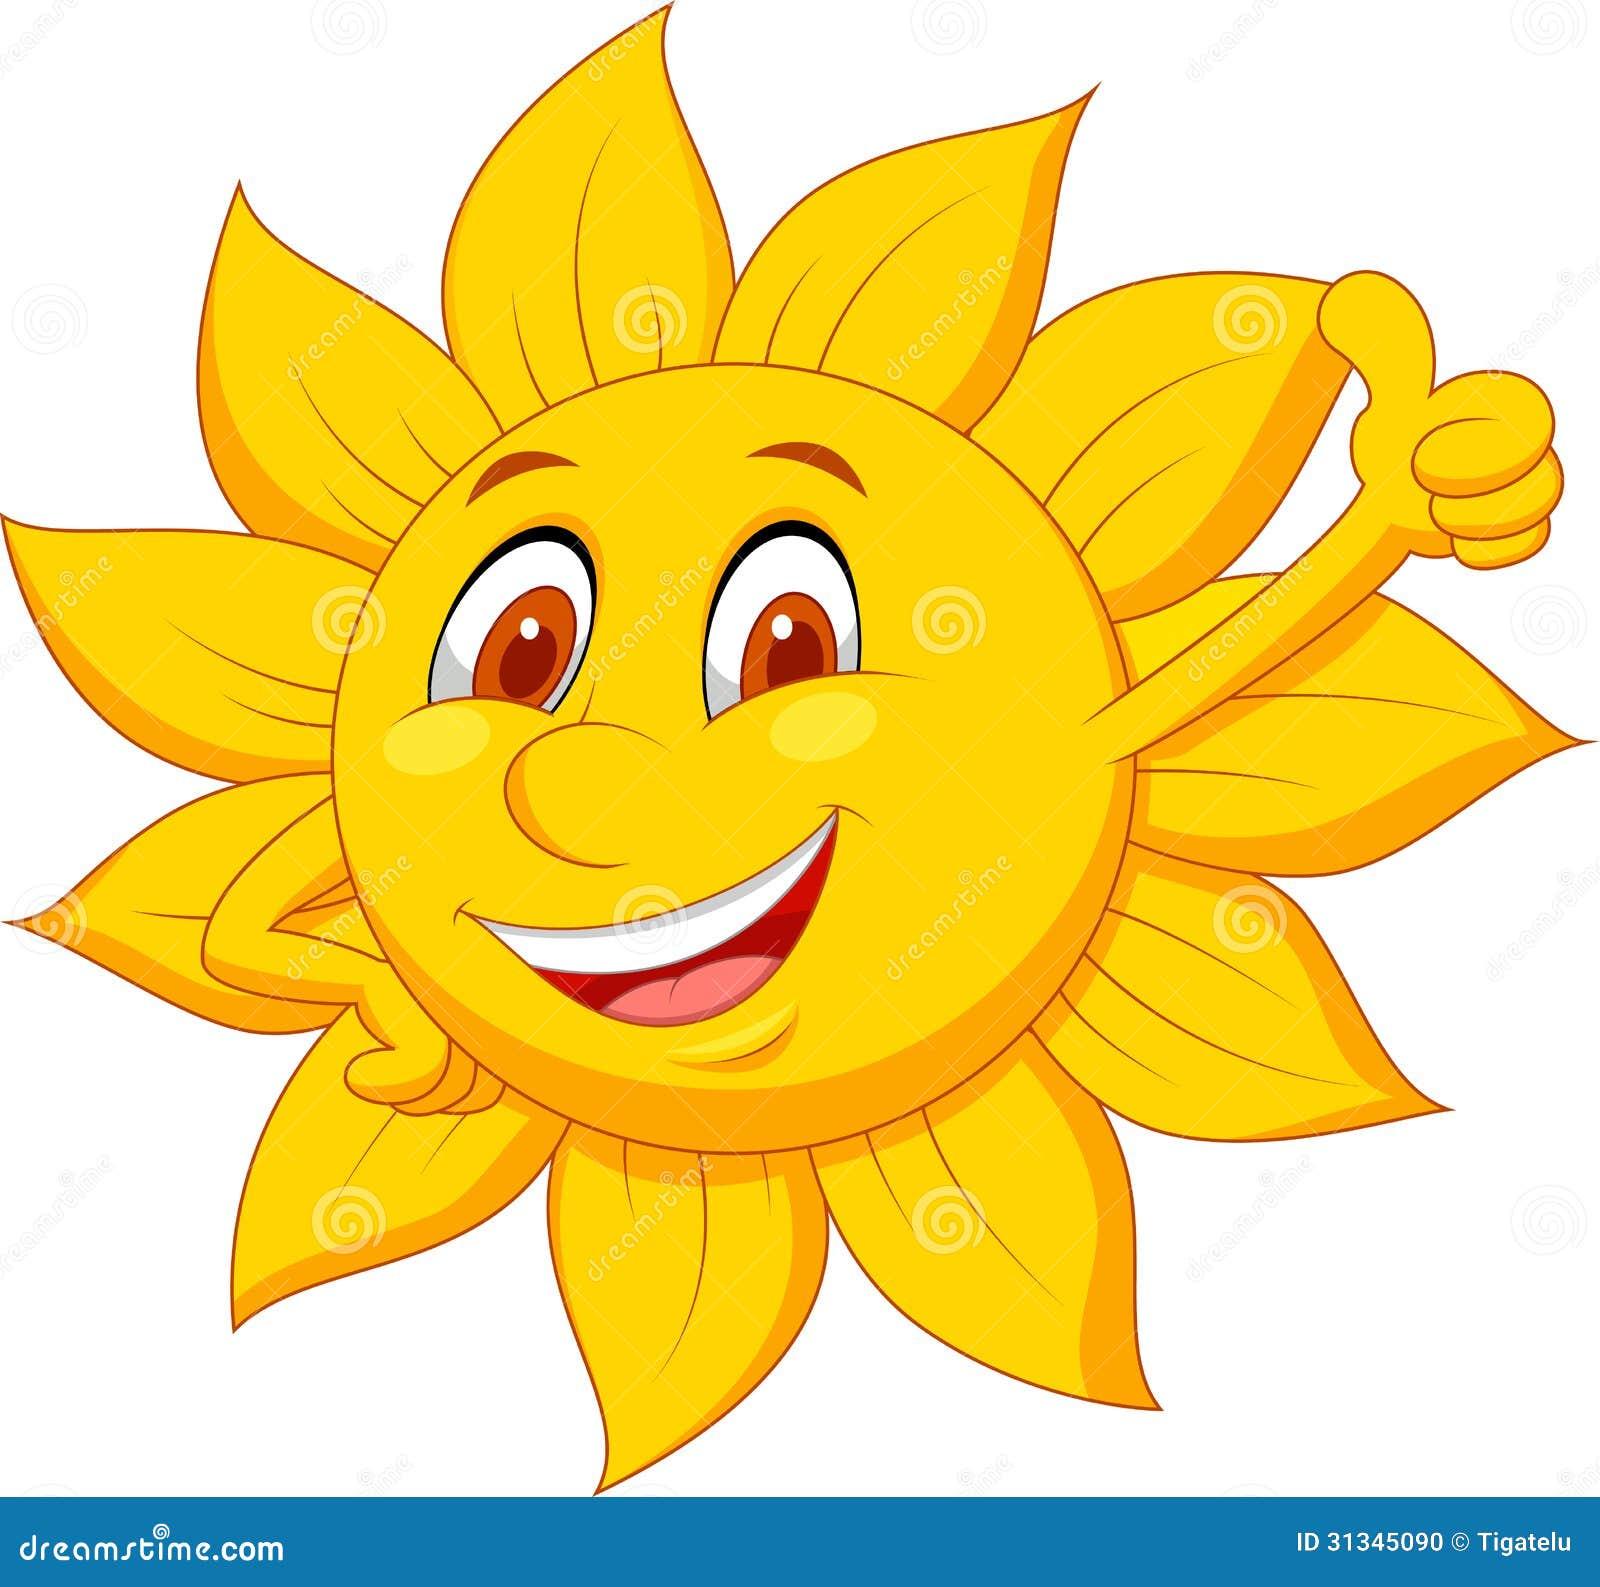 Sun Cartoon Character With Thumb Up Illustration 31345090 Megapixl